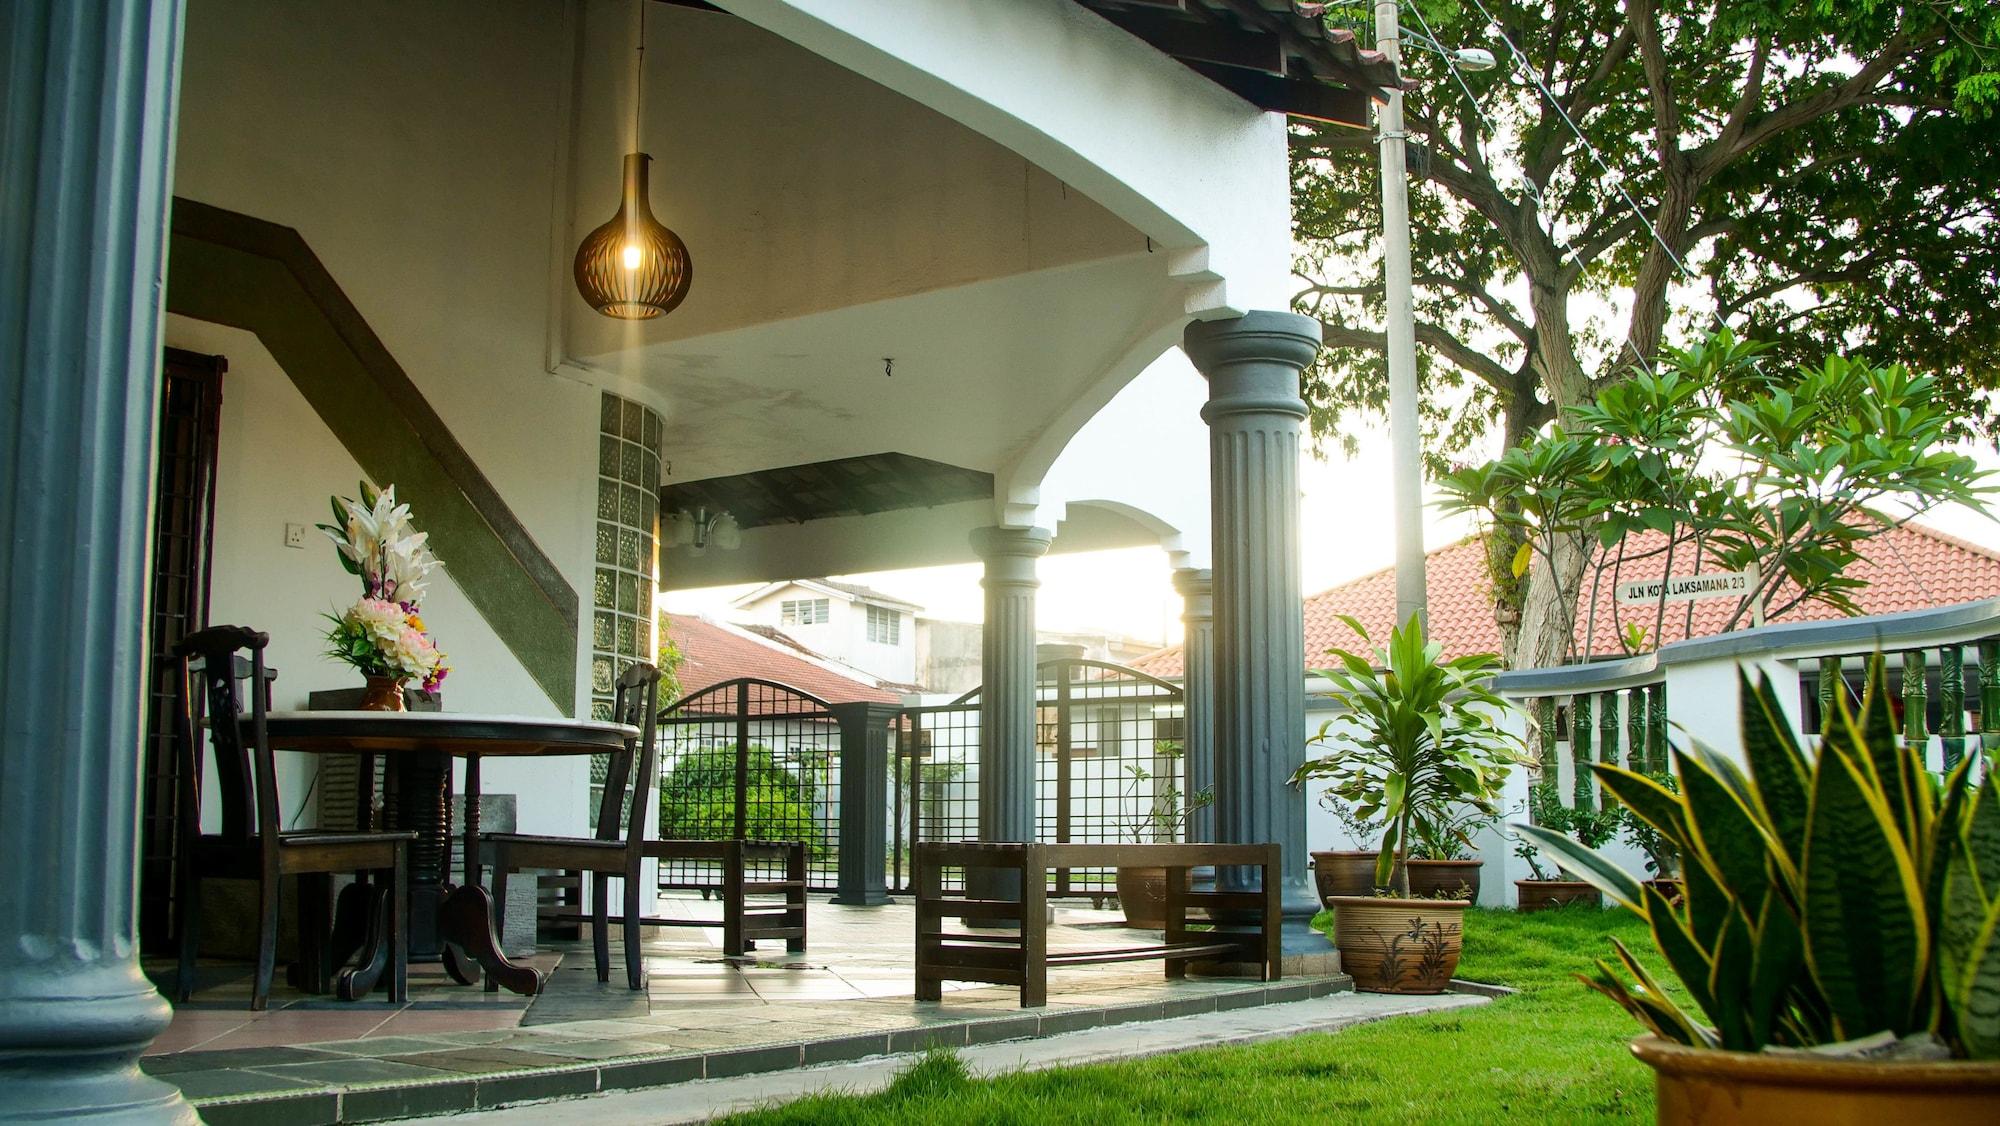 The Paradise, Kota Melaka